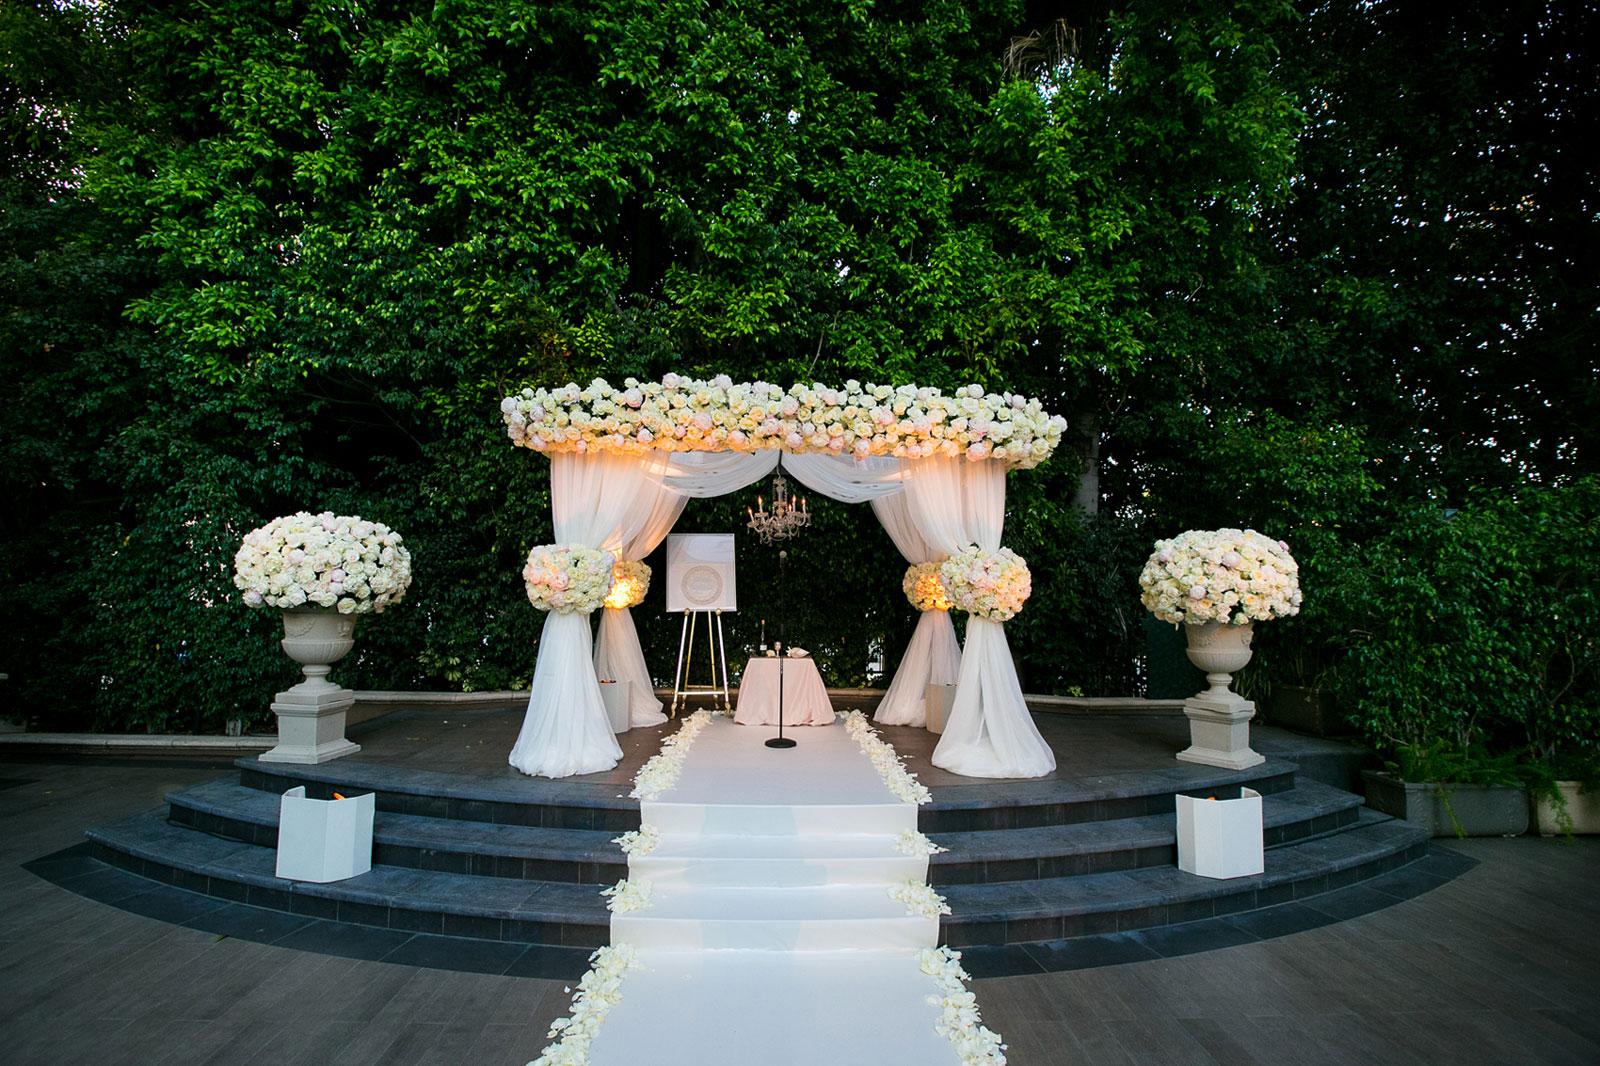 Rose canopy white drapery outdoor chuppah Jewish wedding ceremony